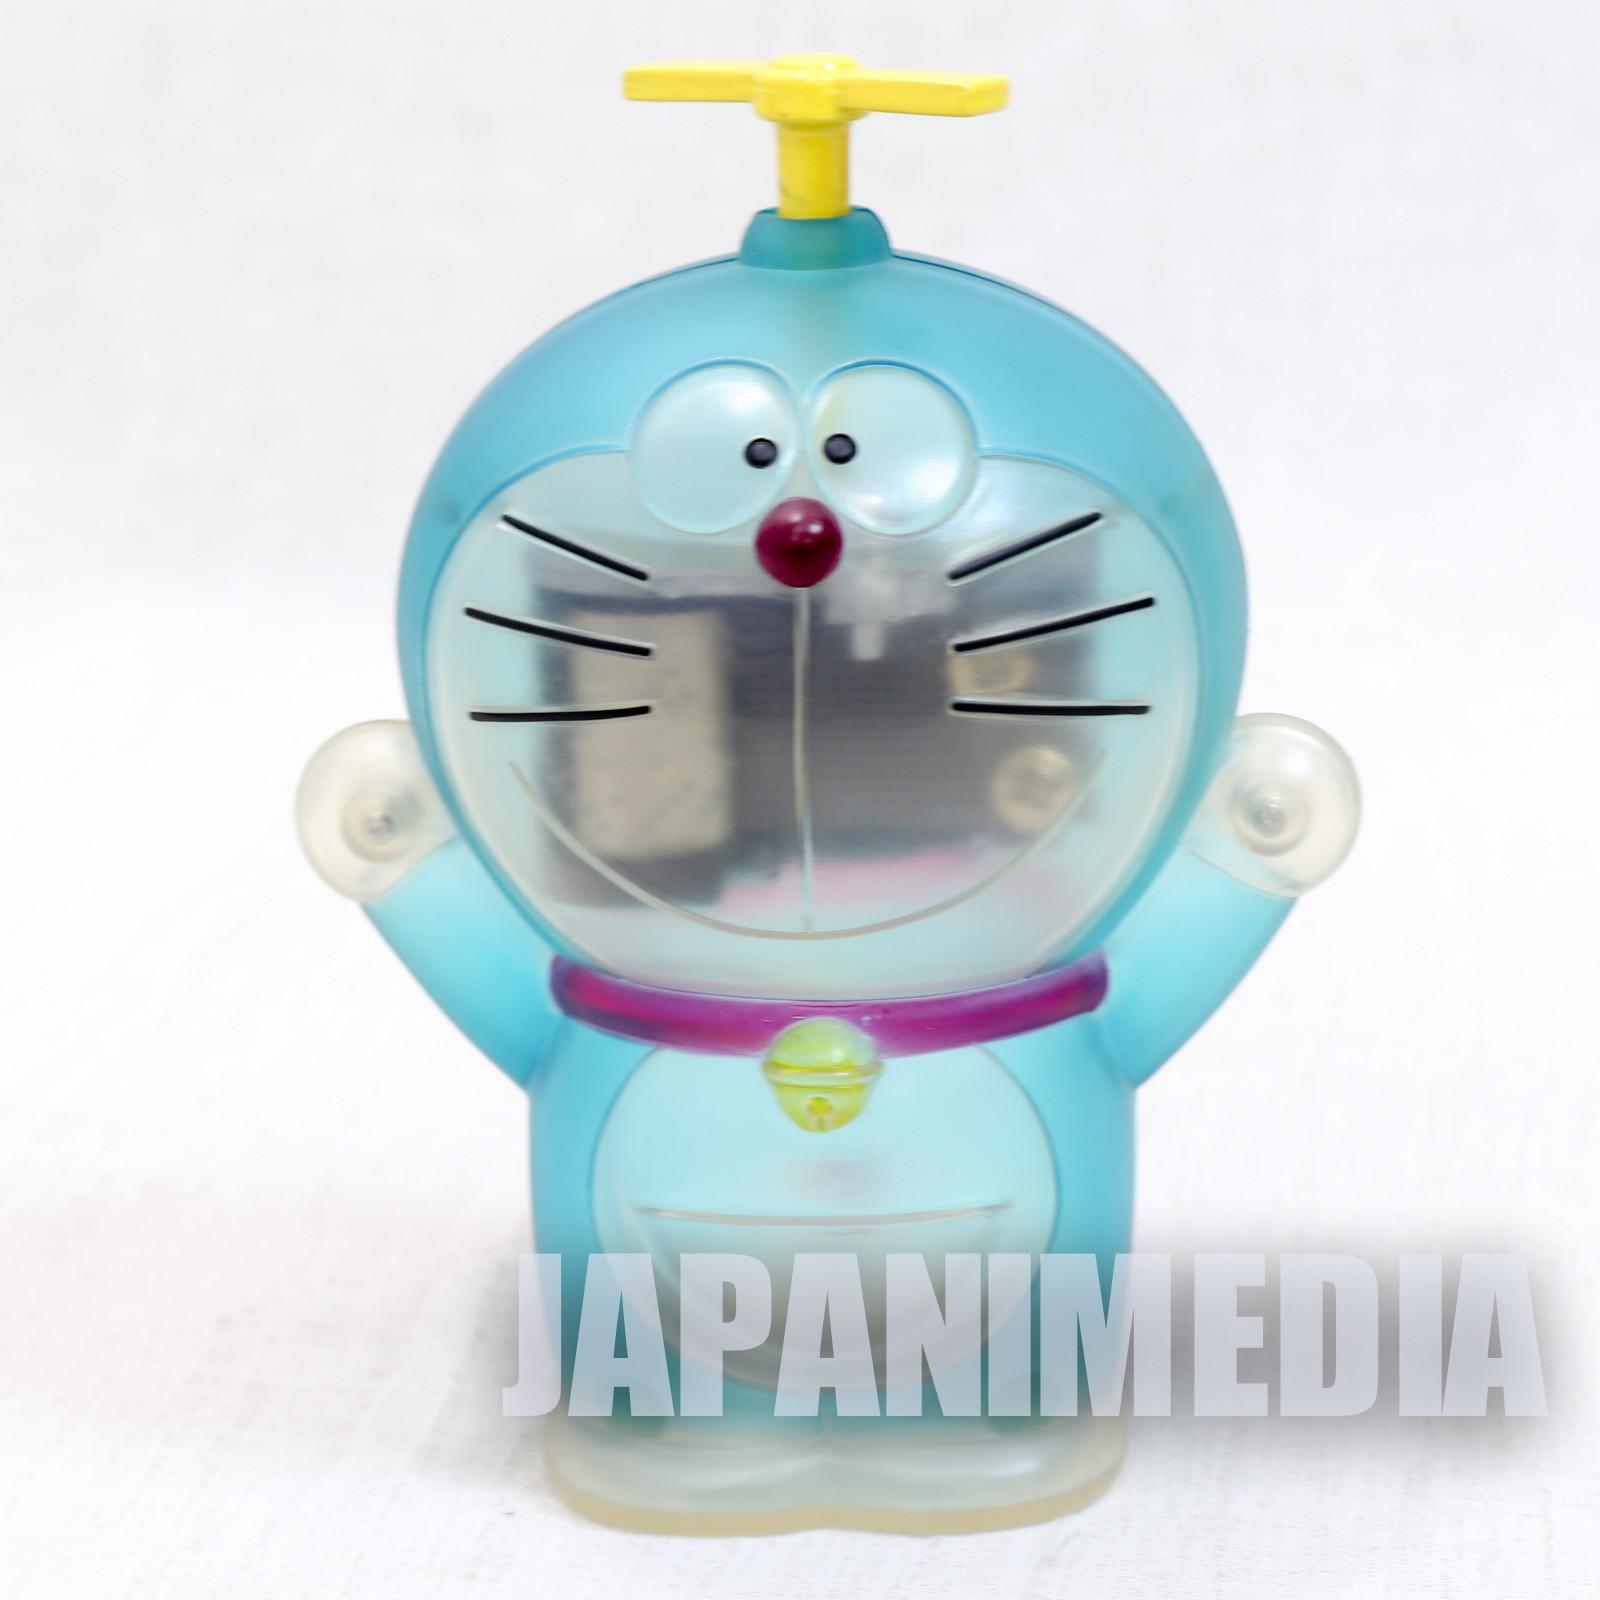 Doraemon Figure type Music Box Clear Blue Ver. OP Theme Song JAPAN ANIME  FUJIO (No box)